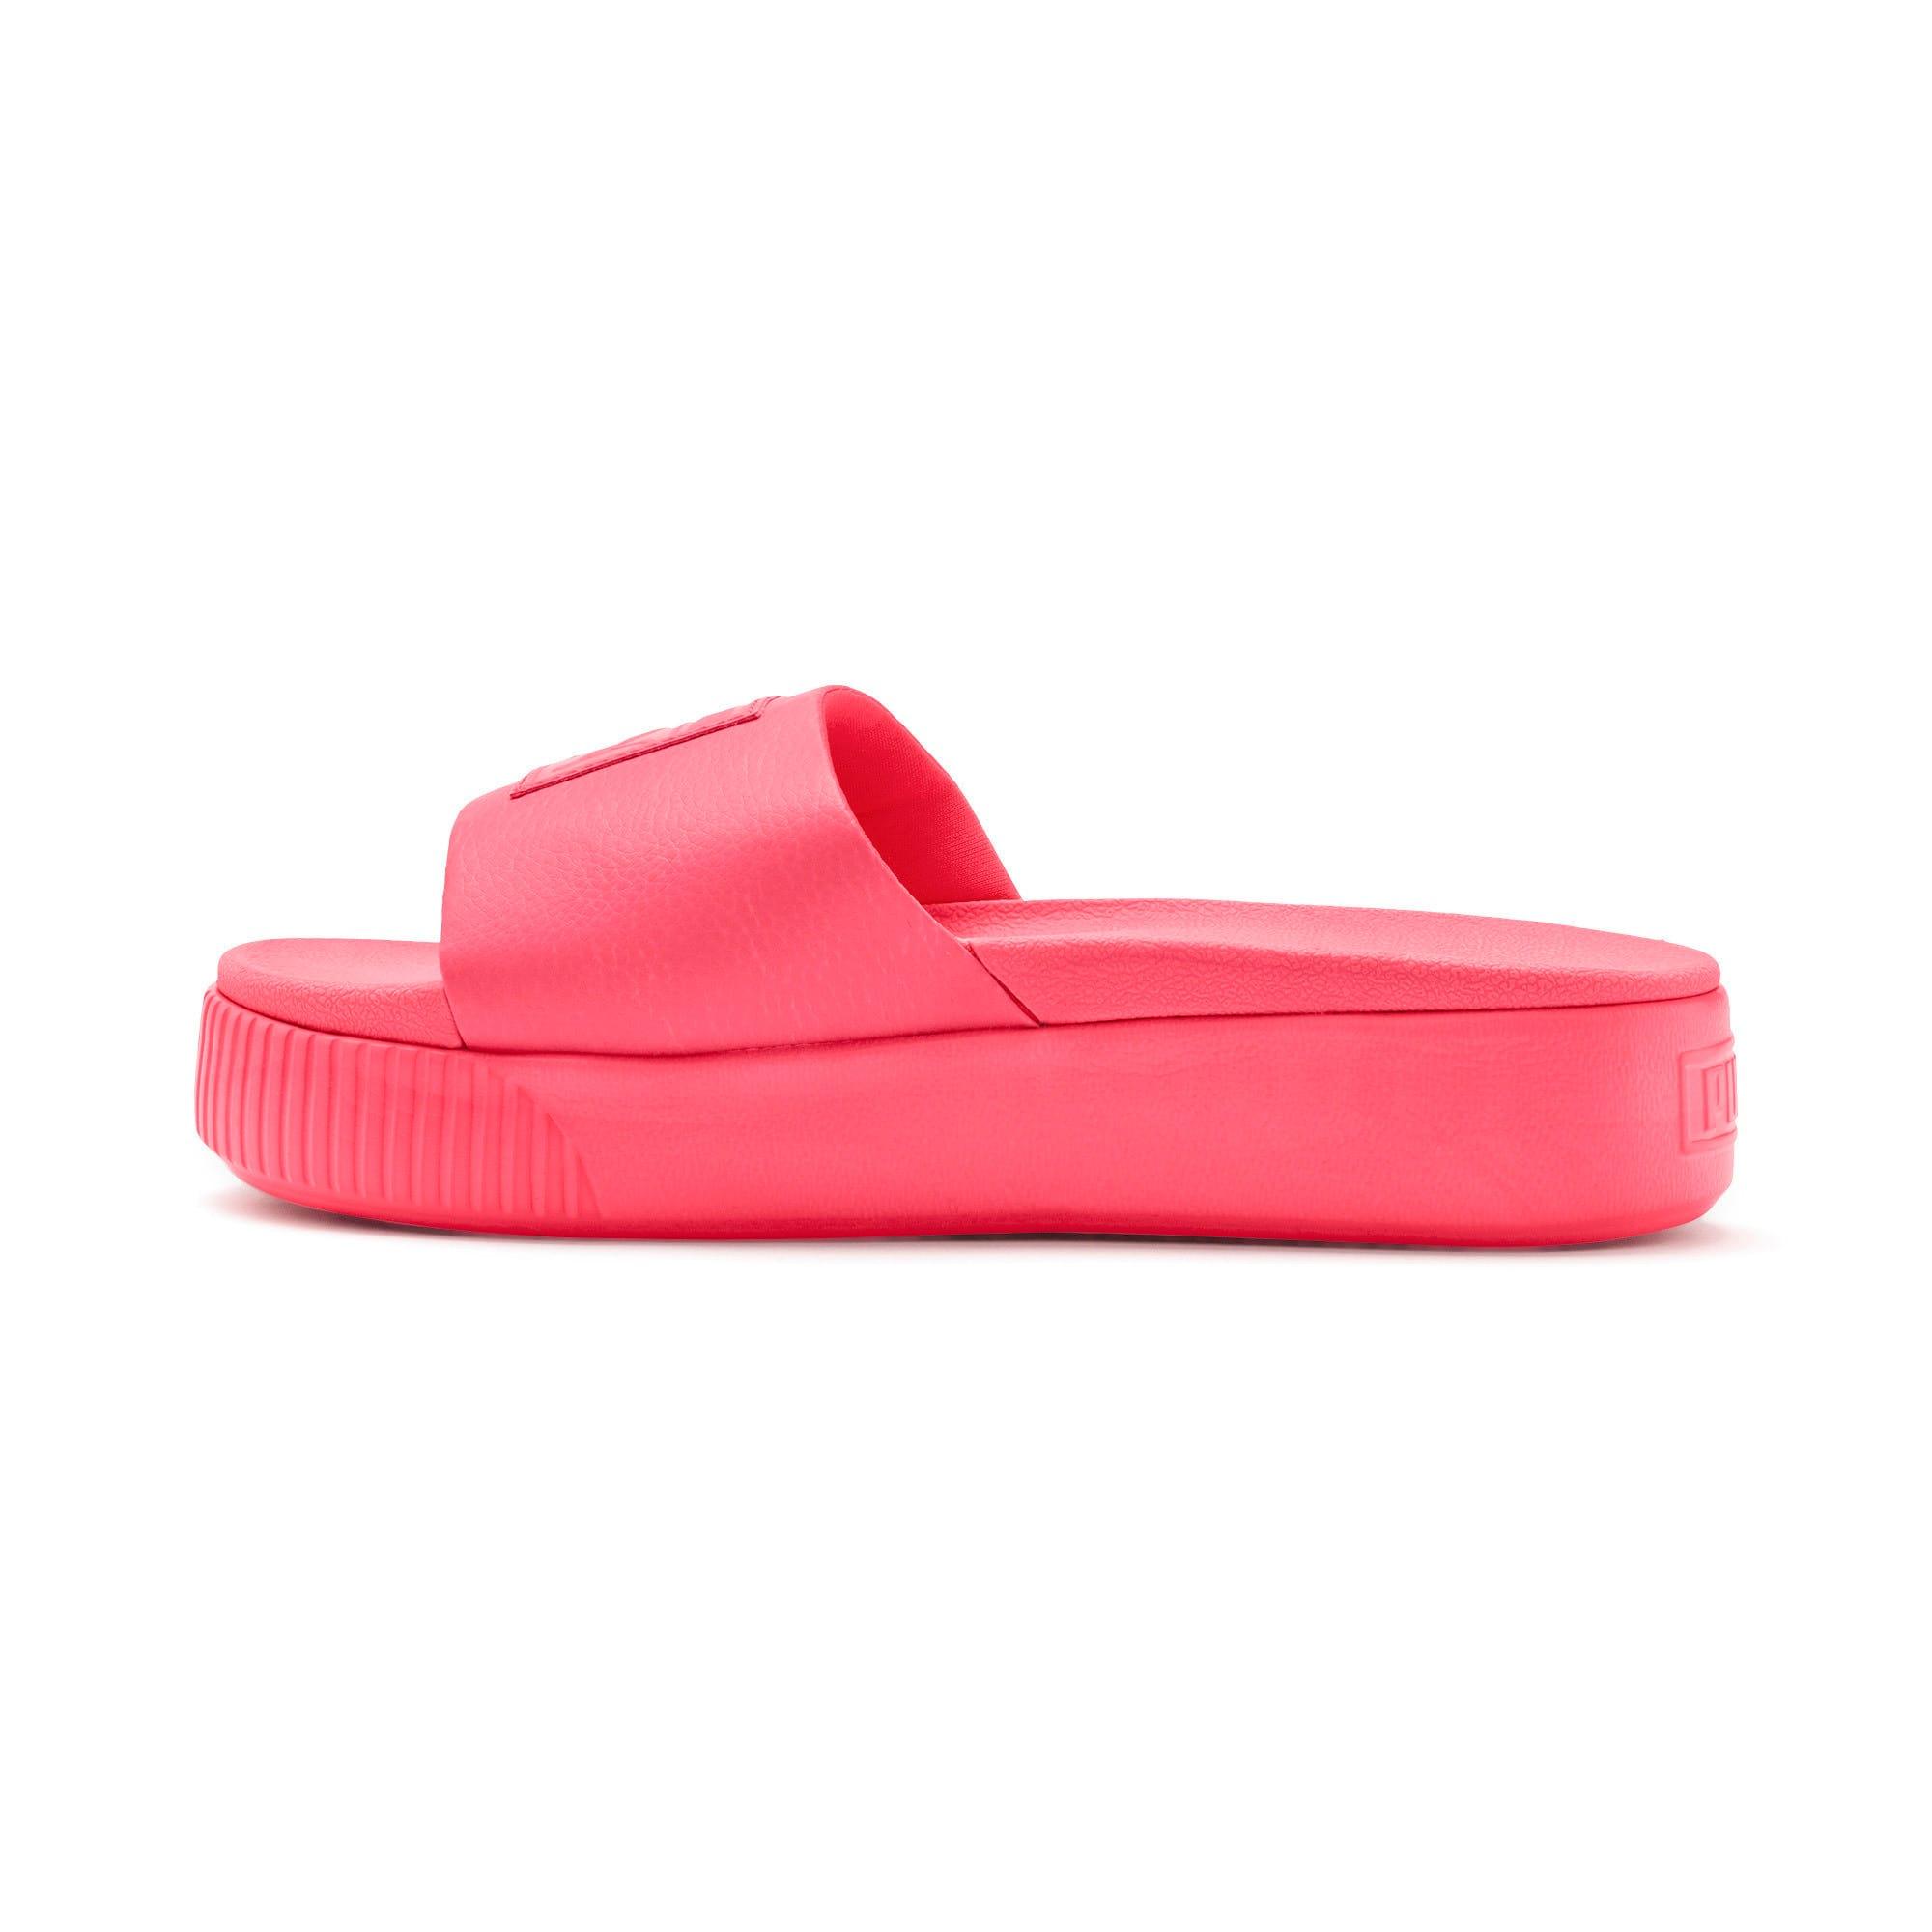 Thumbnail 1 of Platform Slide Women's Sandals, Pink Alert-Pink Alert, medium